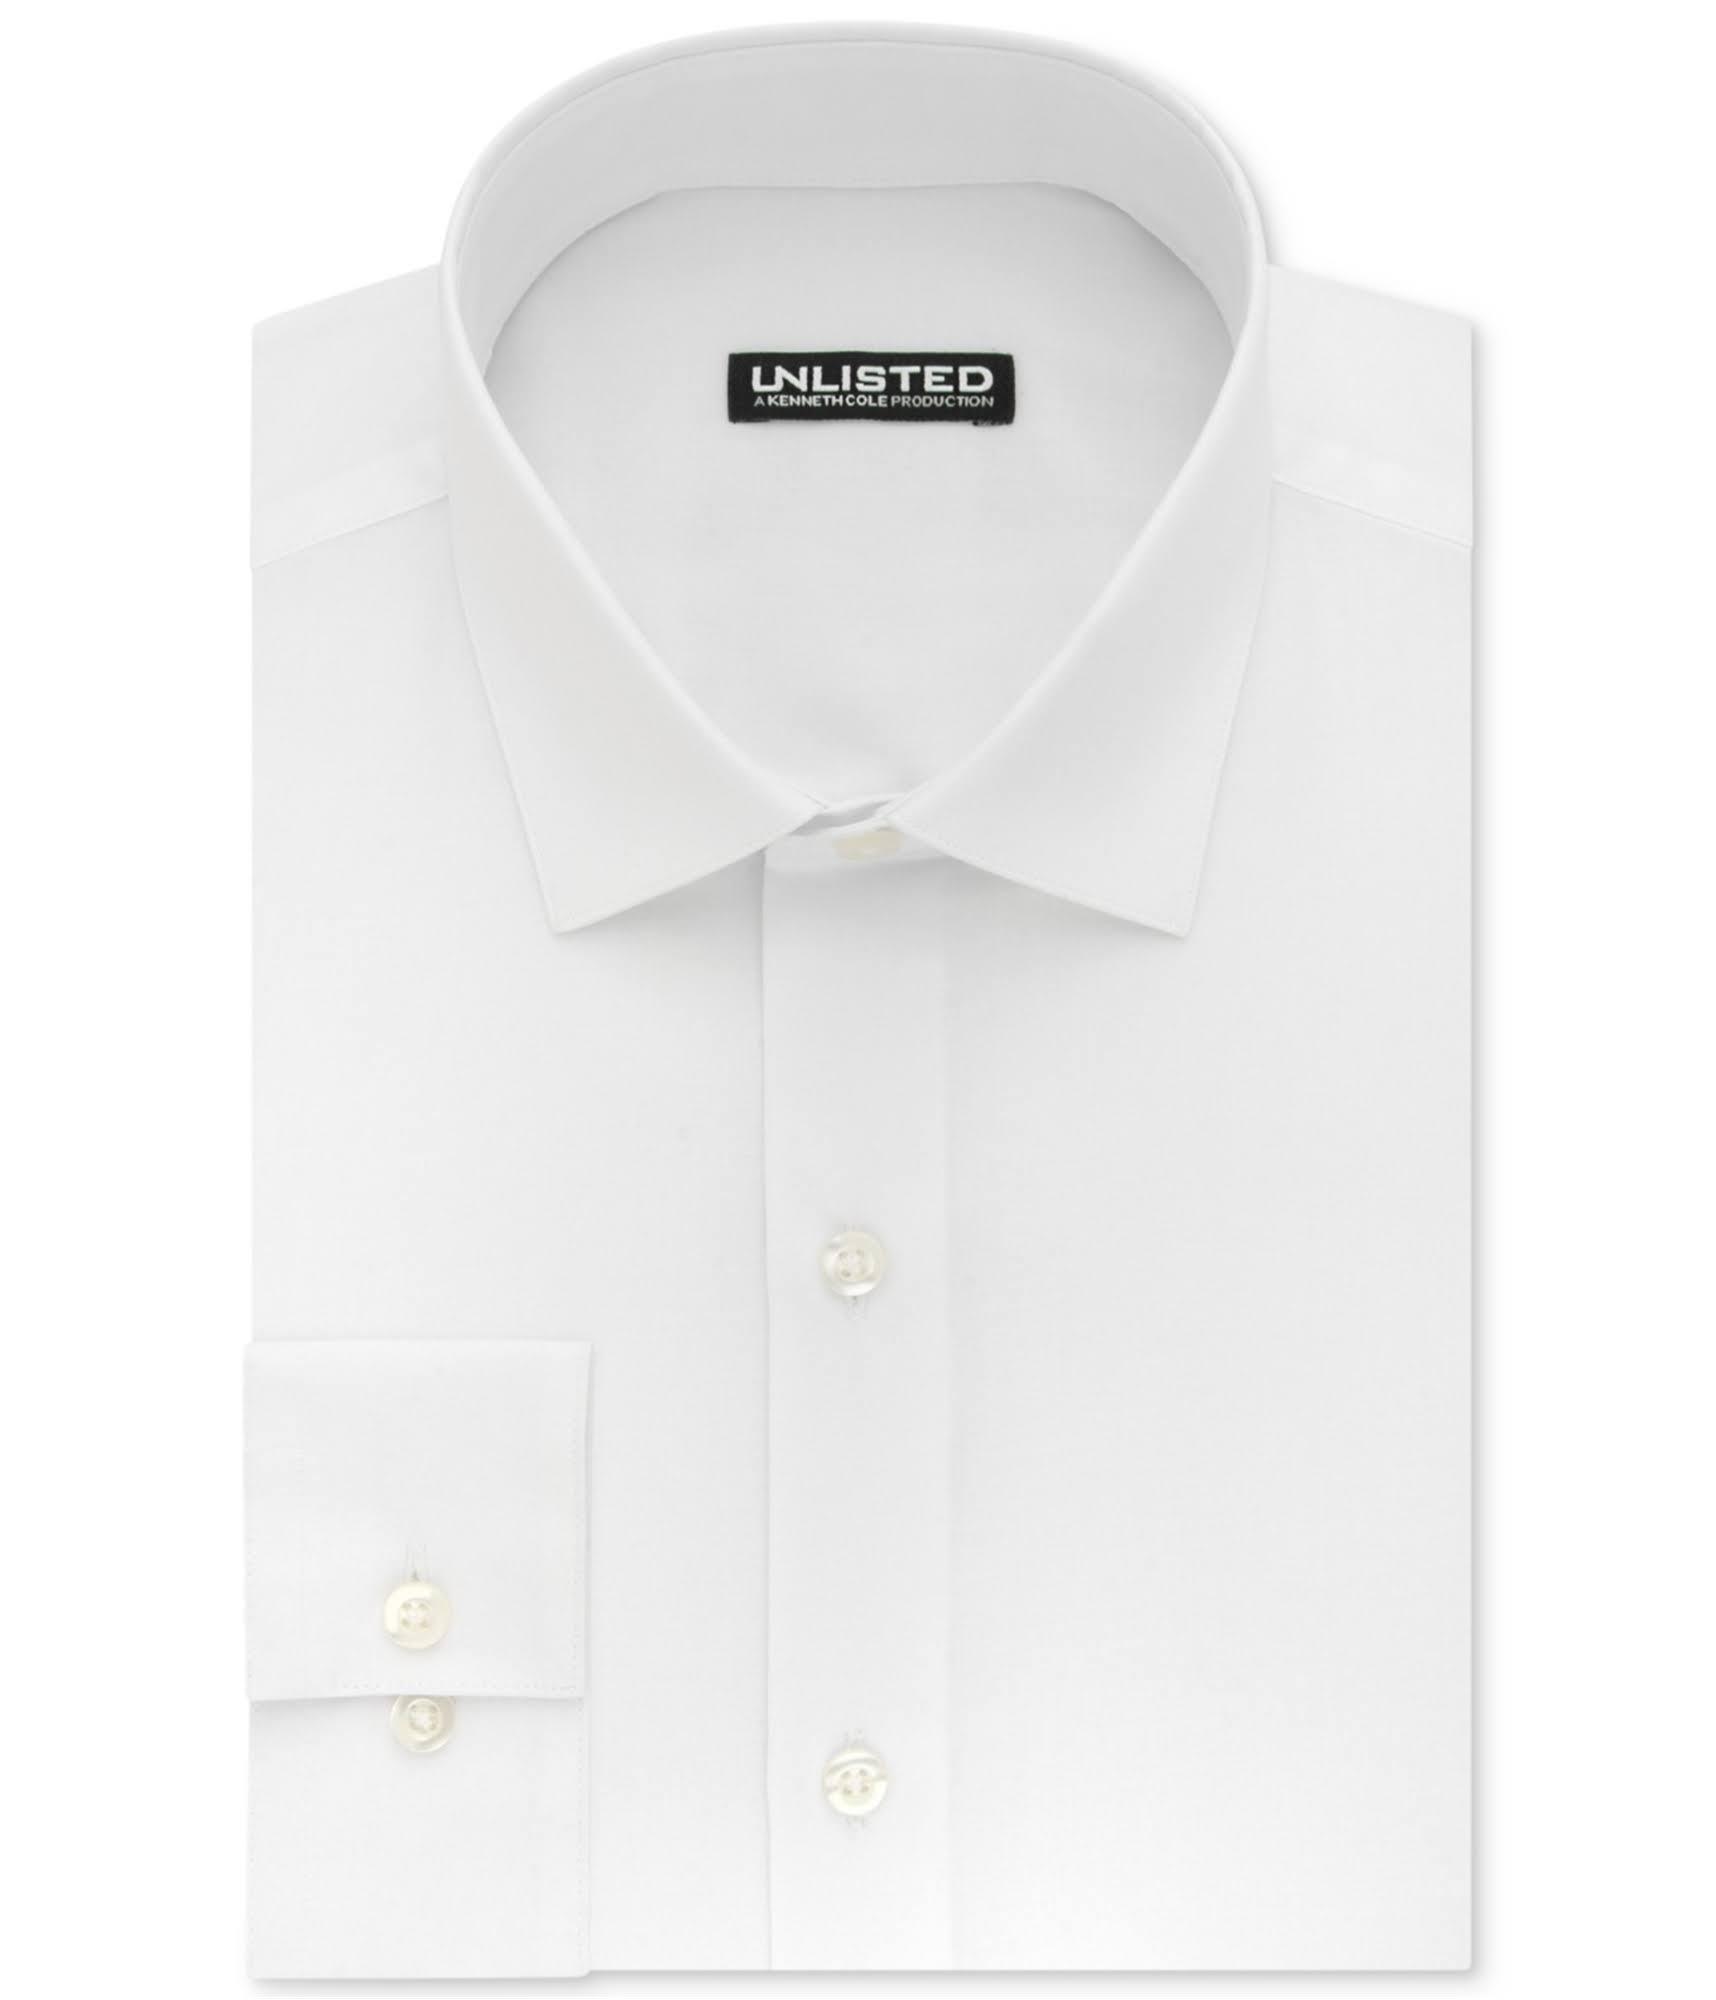 Solid Kenneth Camisa Slim De White Cole Hombre Fit Para Vestir Unlisted zUqw7TrBz